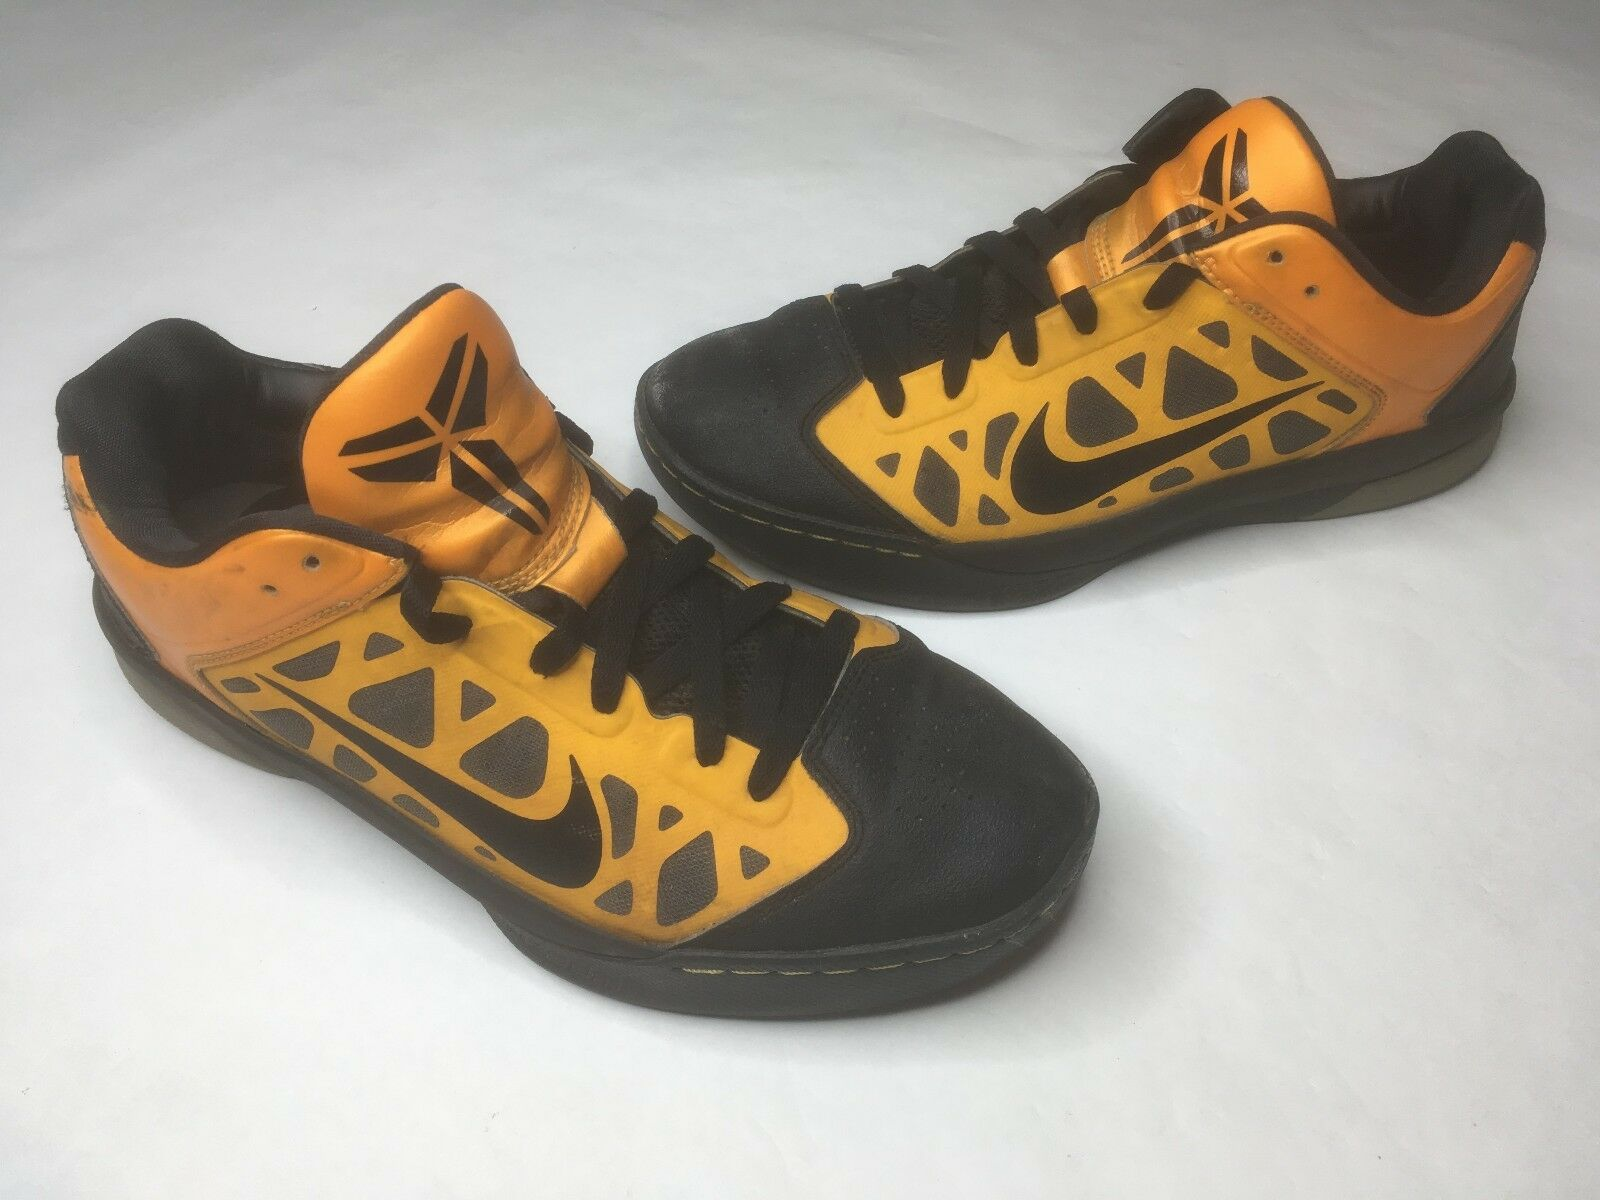 Nike Dream Season IV University Sneaker Shoes Black Gold, 524870-700, 10, RARE! Wild casual shoes